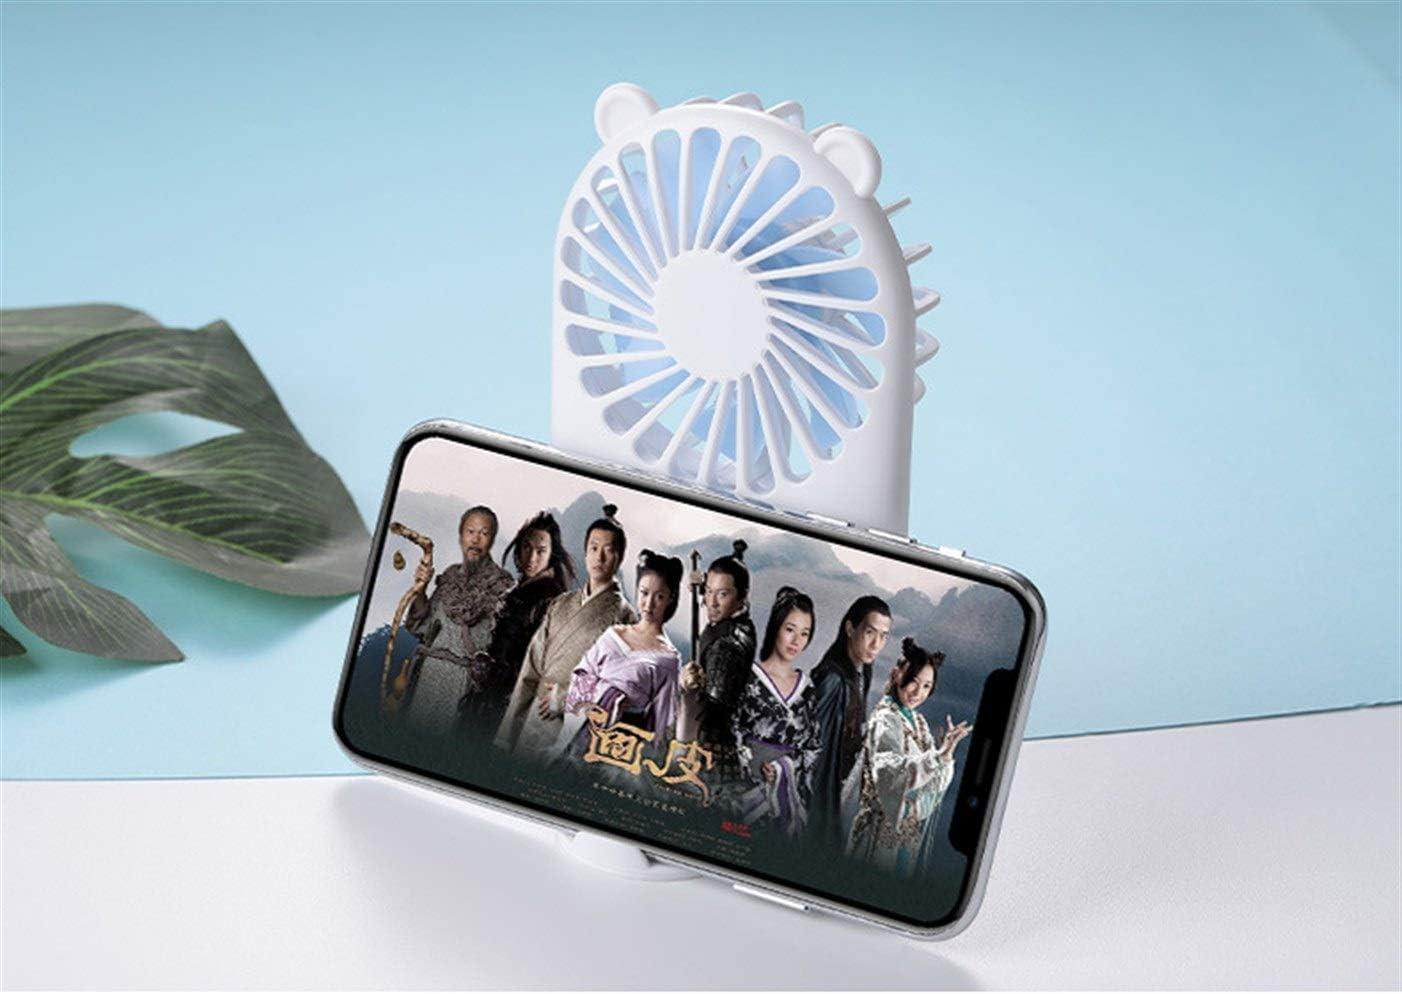 Pocket Handheld Fan ricaricabile mini ventilatore USB piccolo ventilatore portatile desktop Pocket Mini Fan (Color : 7) 6